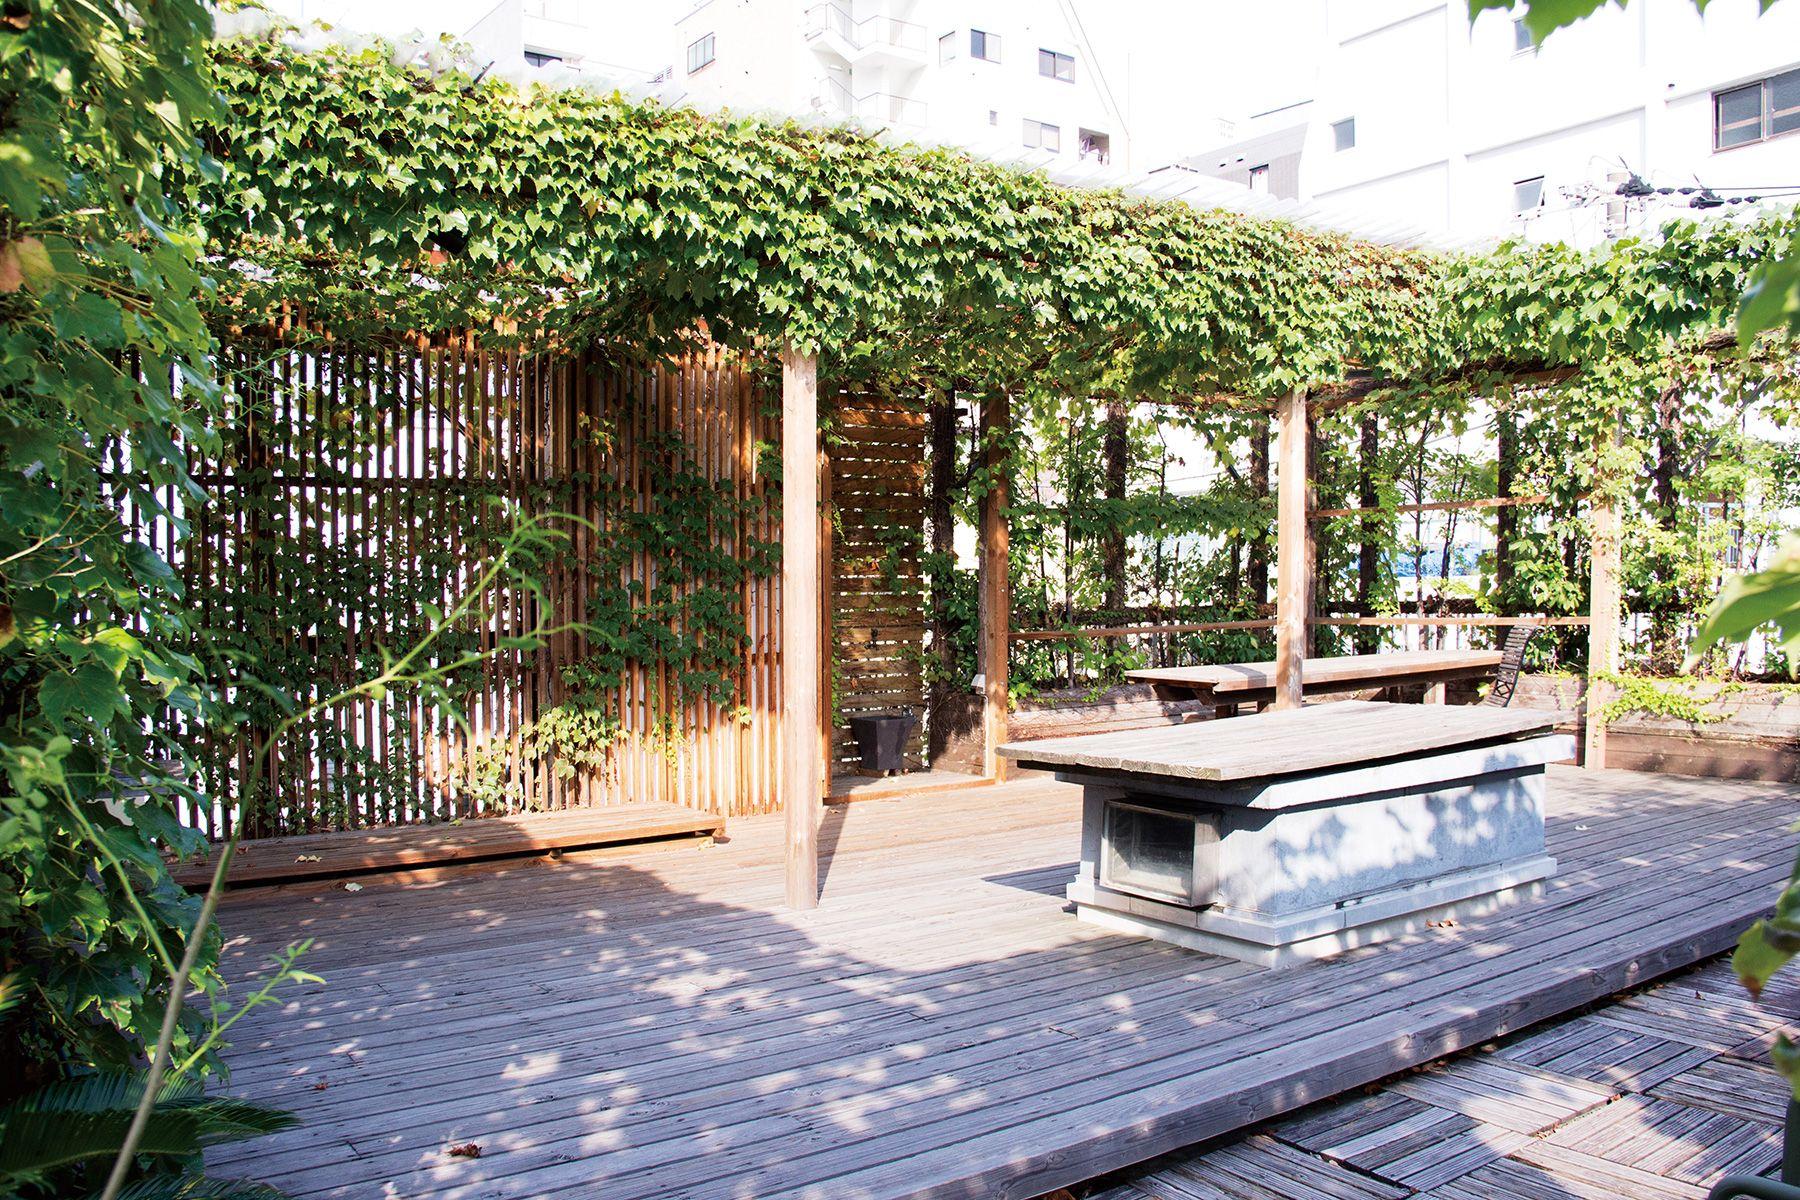 LIGHT BOX STUDIO 青山 2F (ライトボックススタジオ)ROOF南西から撮影